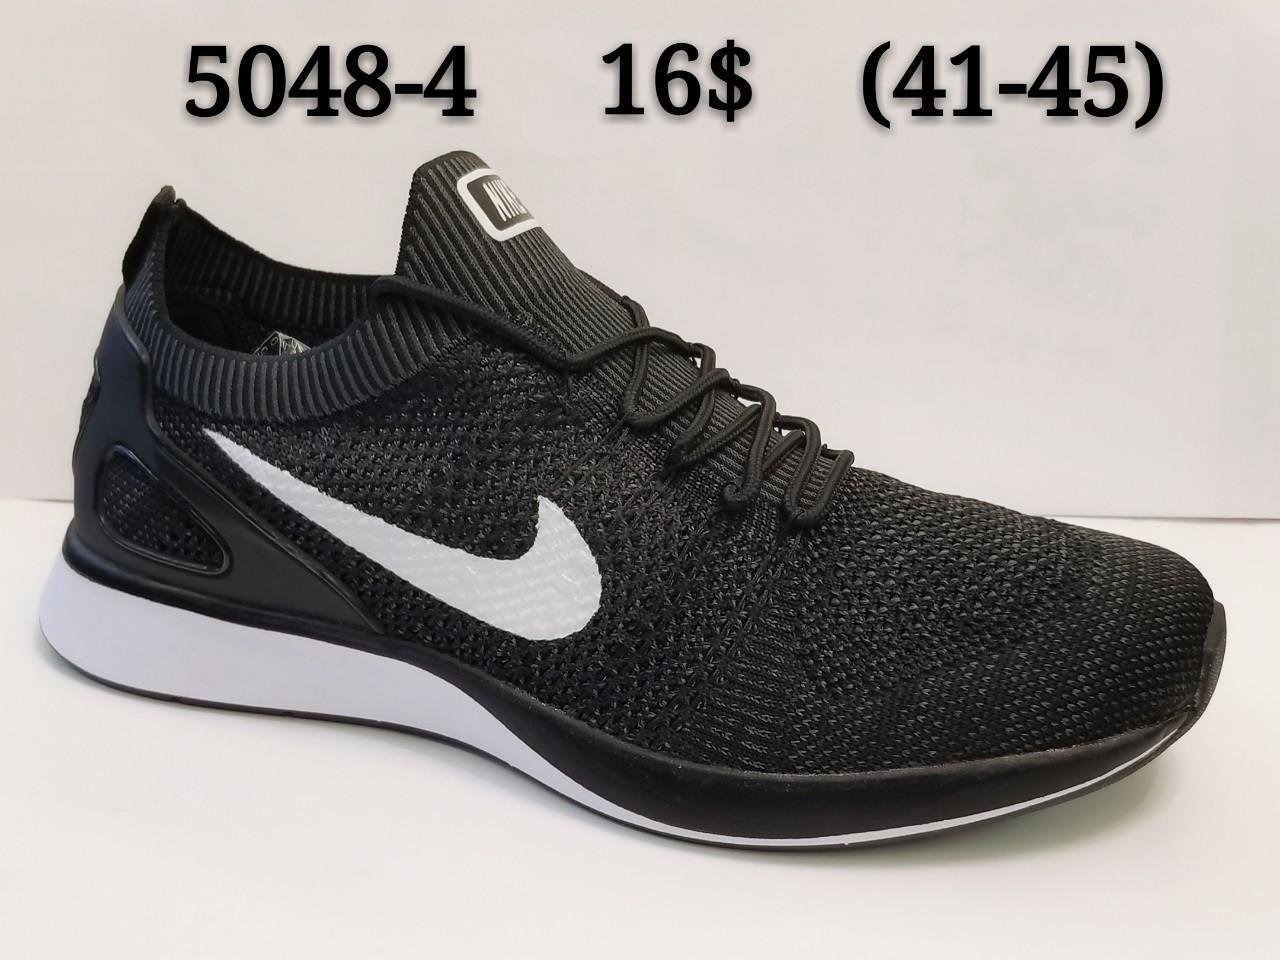 49f3a115 Мужские кроссовки Nike оптом (41-45), цена 432 грн., купить Одеса — Prom.ua  (ID#709067669)